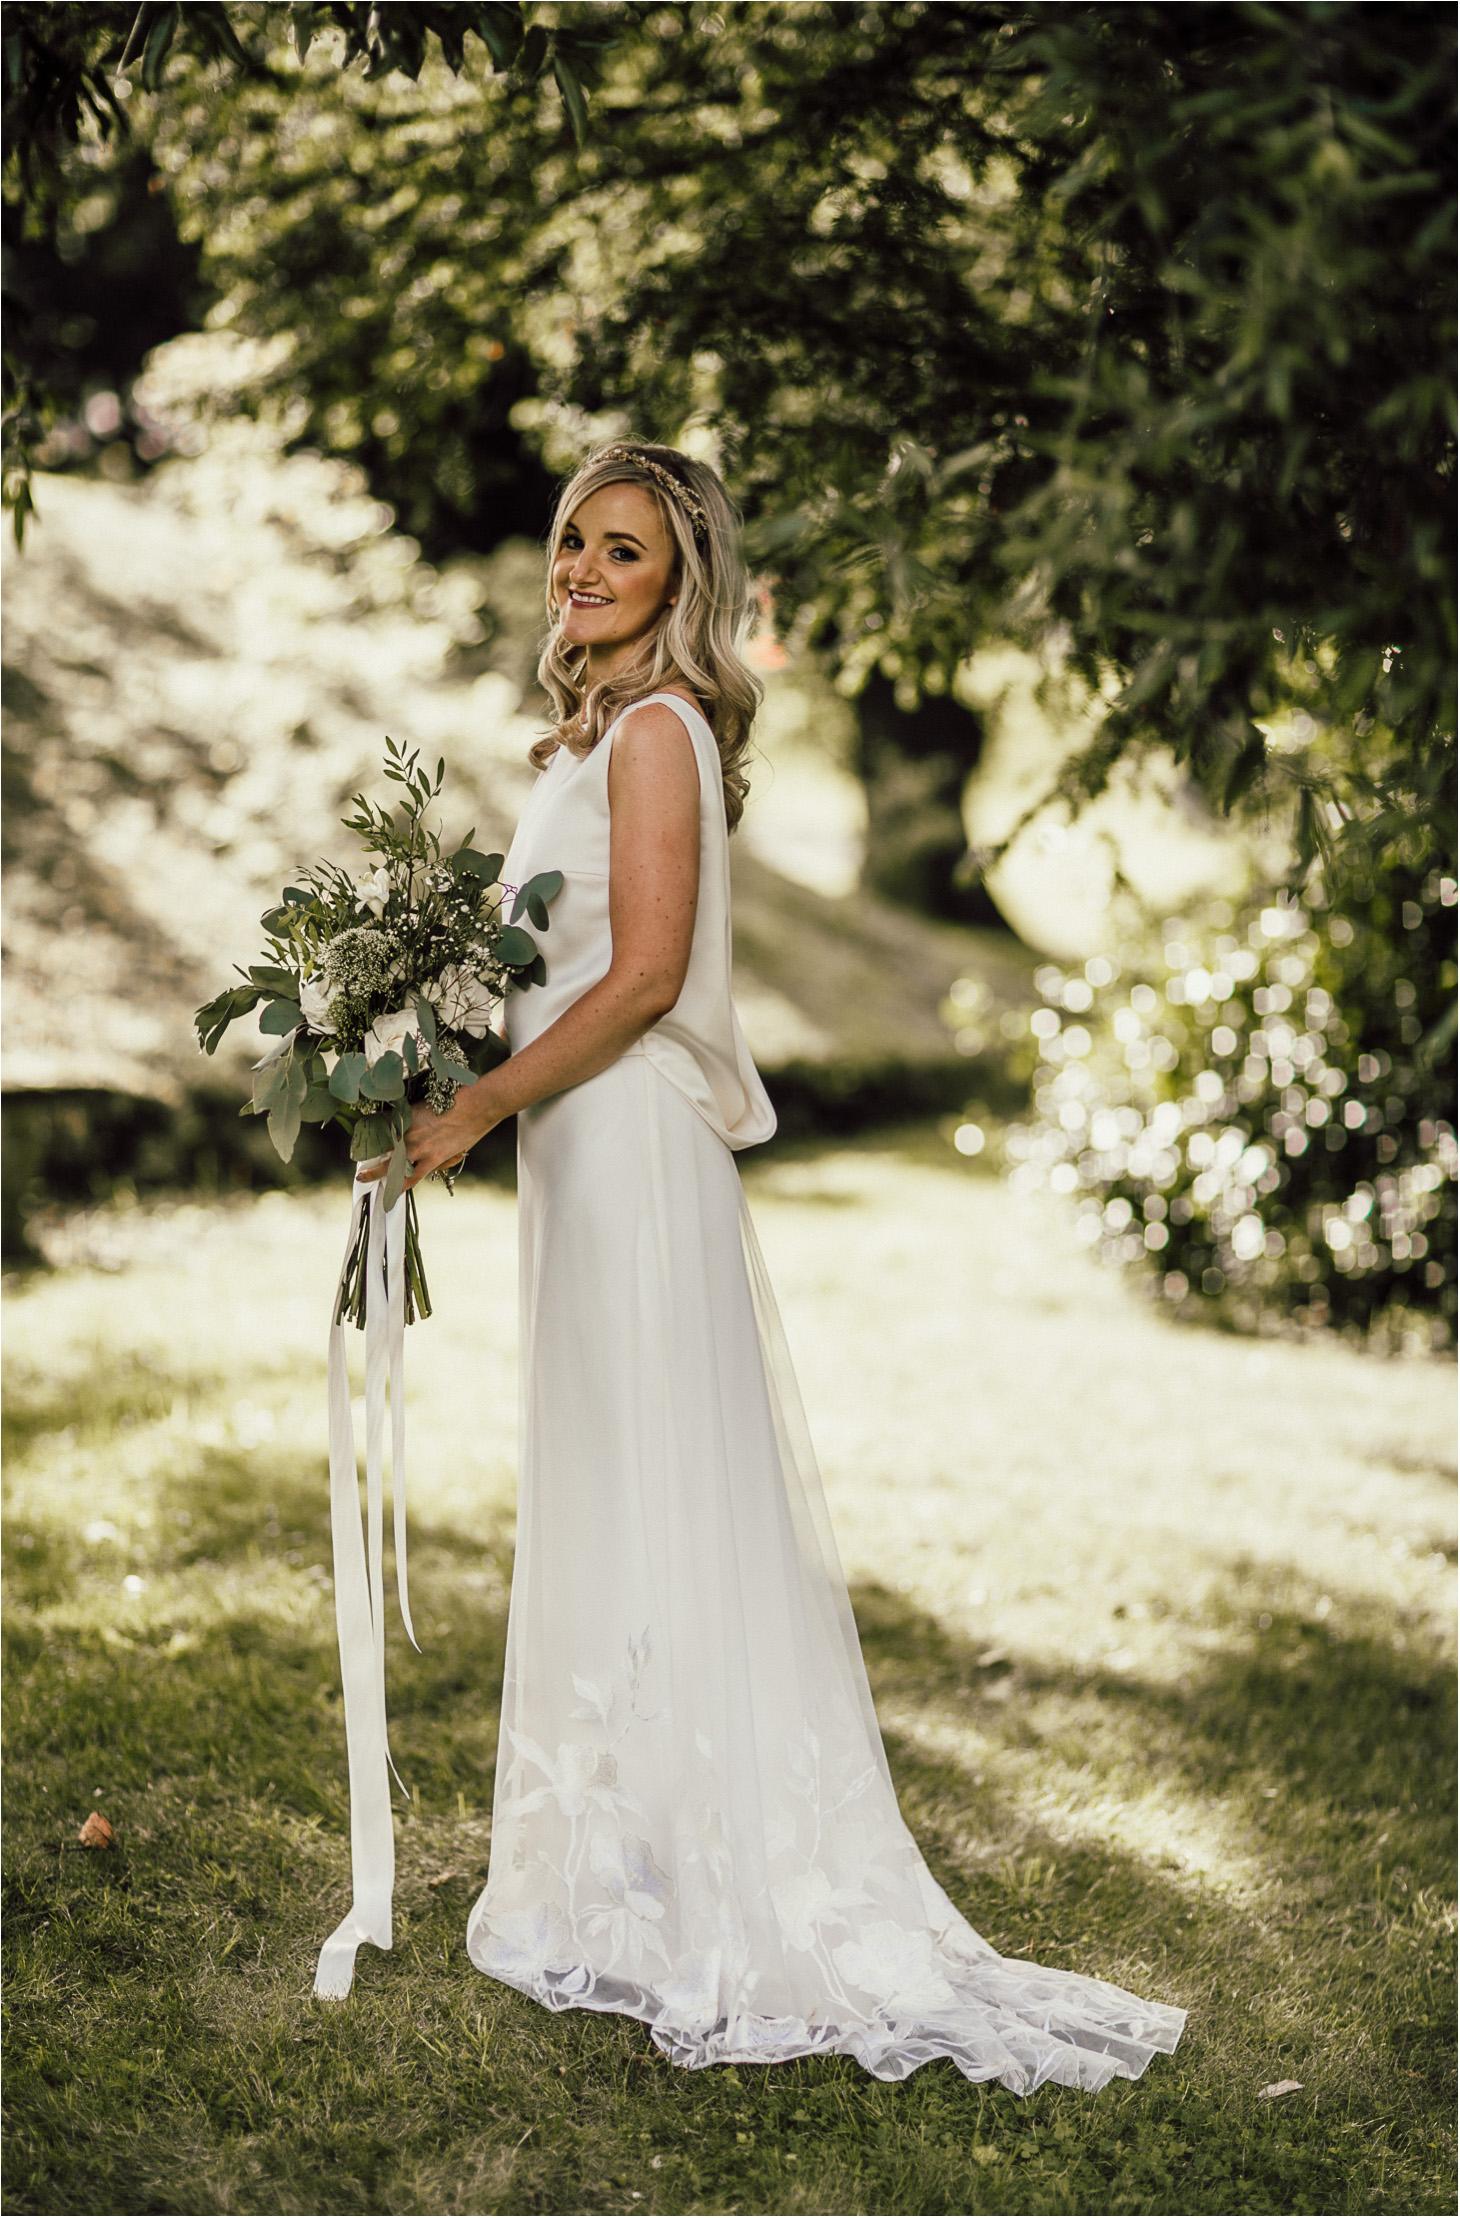 Virgina Lodge Photography. darren fitzpatrick. Wedding.17